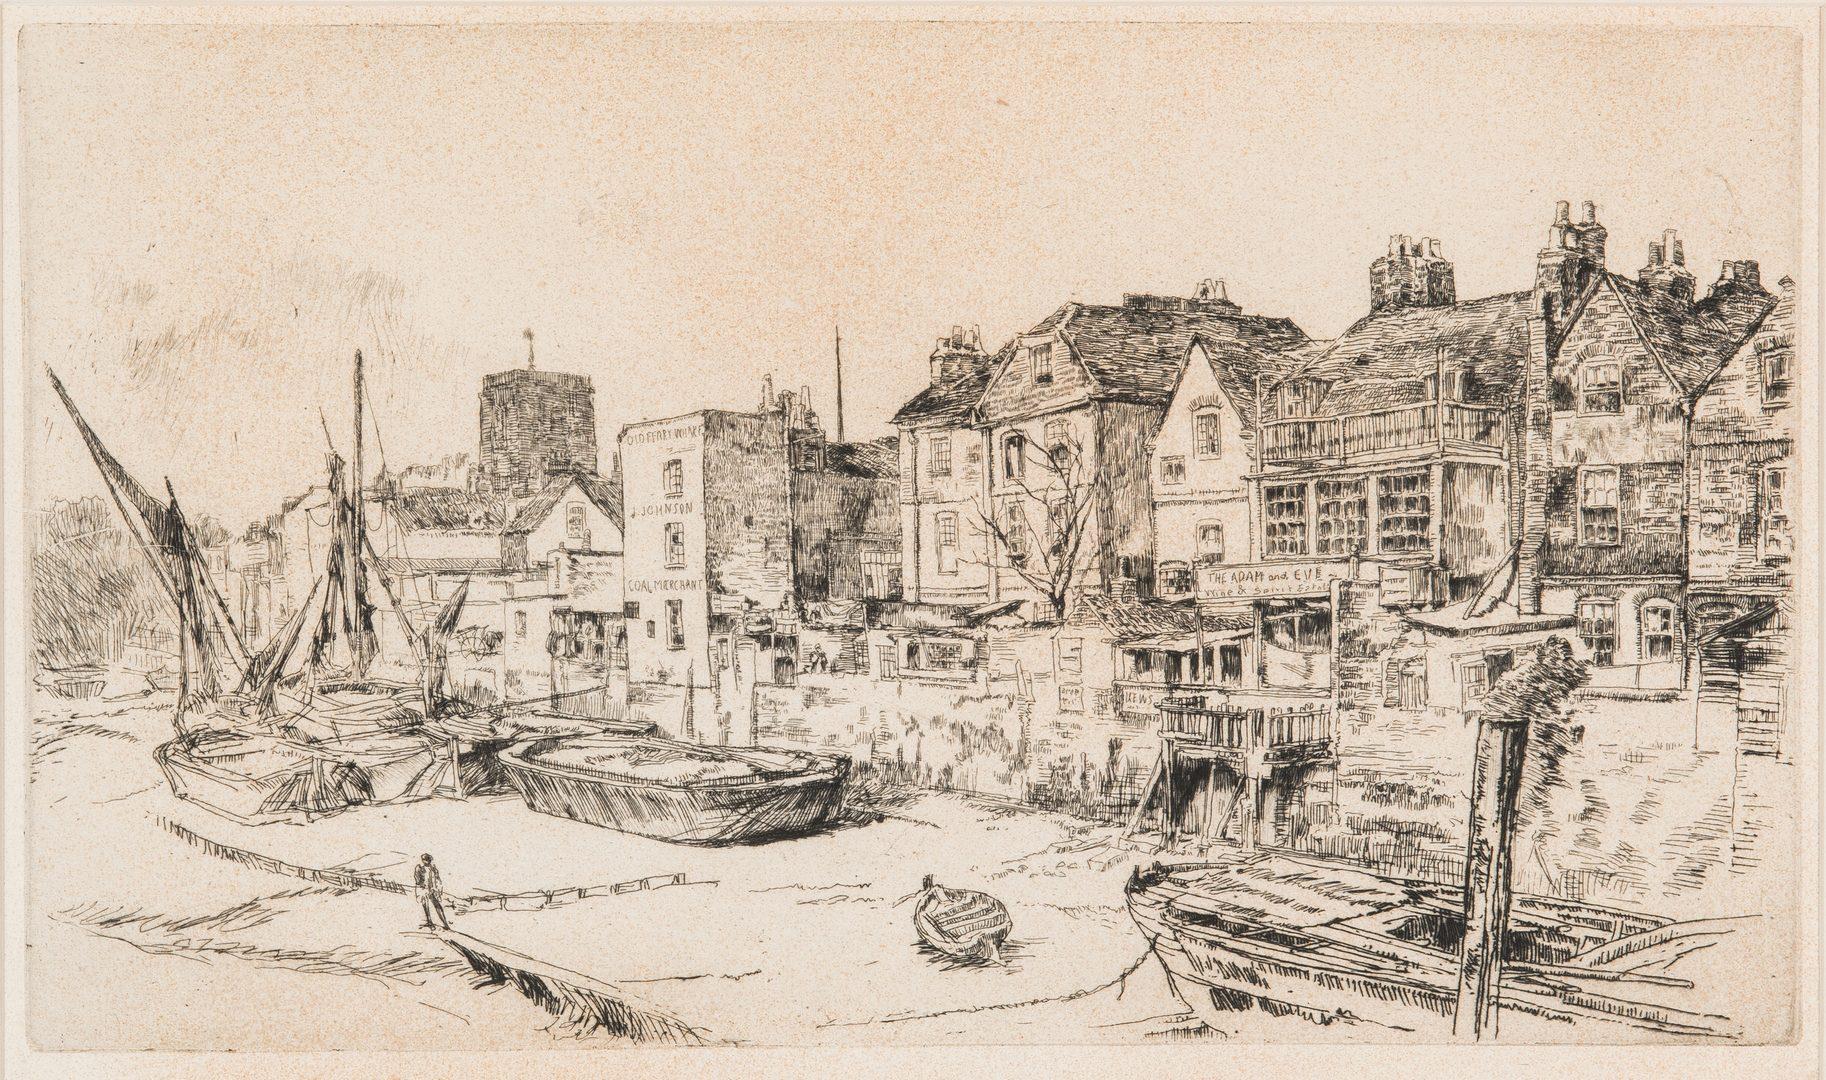 Lot 305: James Whistler Etching, Adam & Eve Tavern